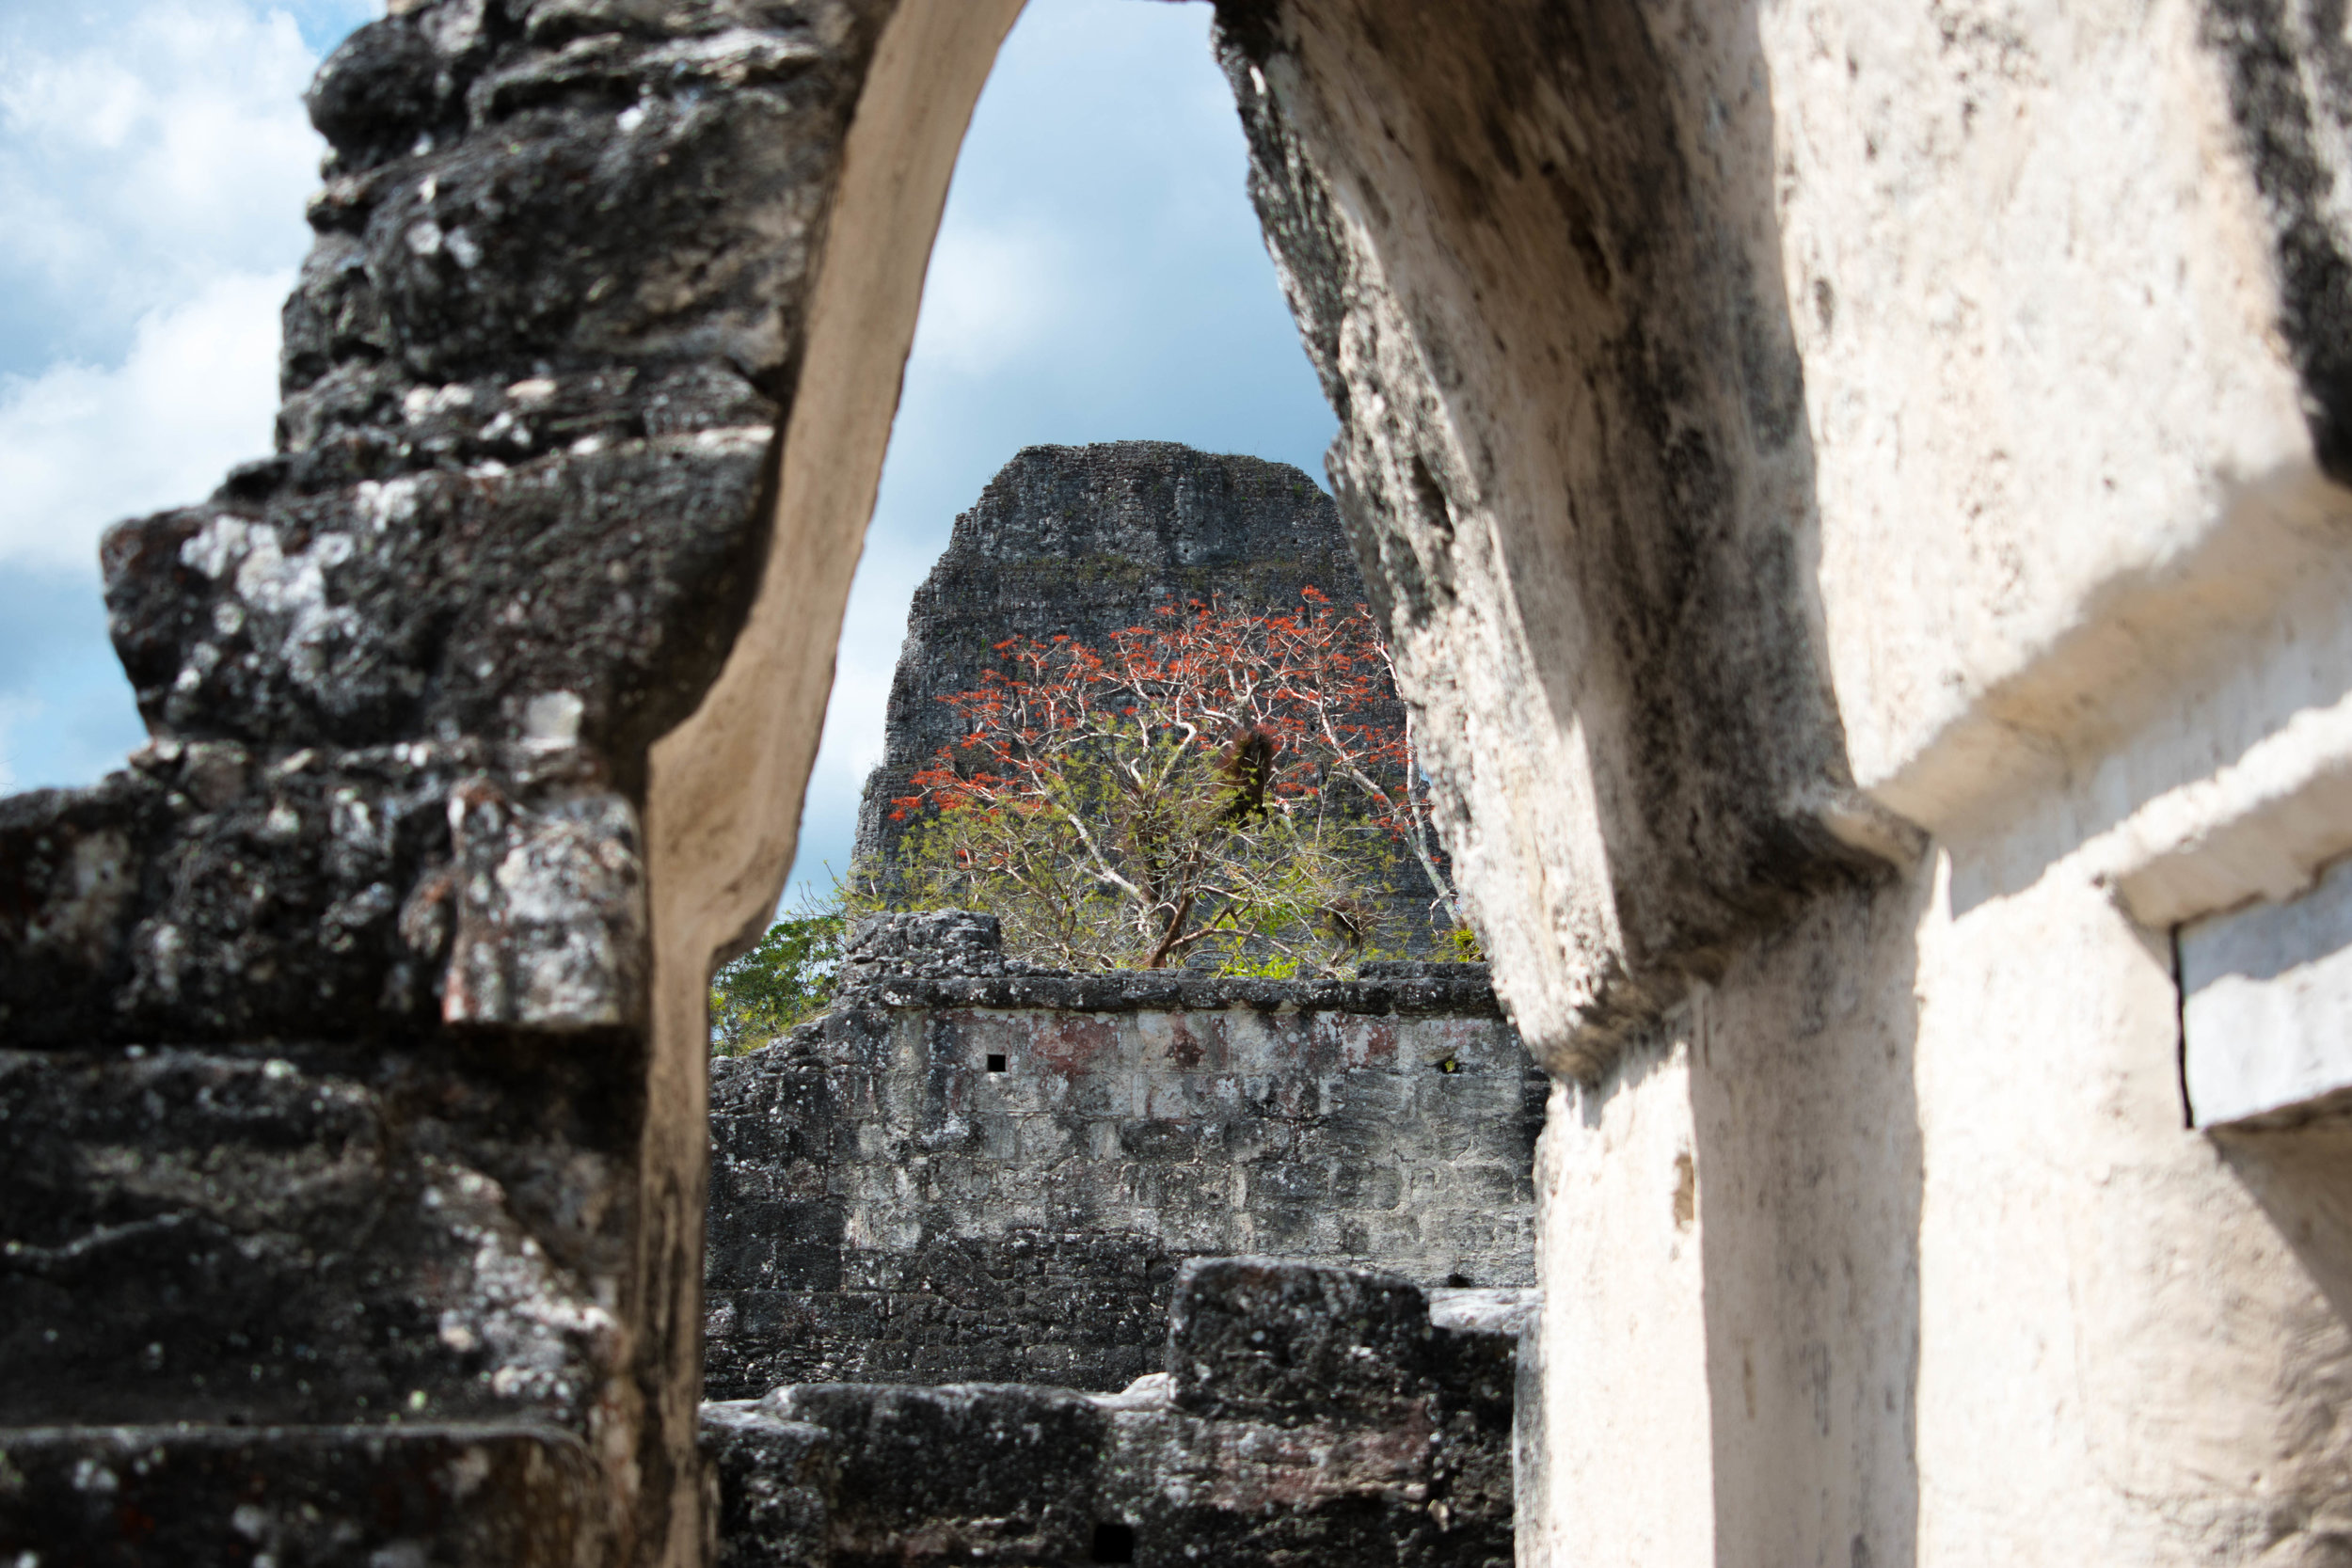 Nature and Stone in Tikal, Guatemala